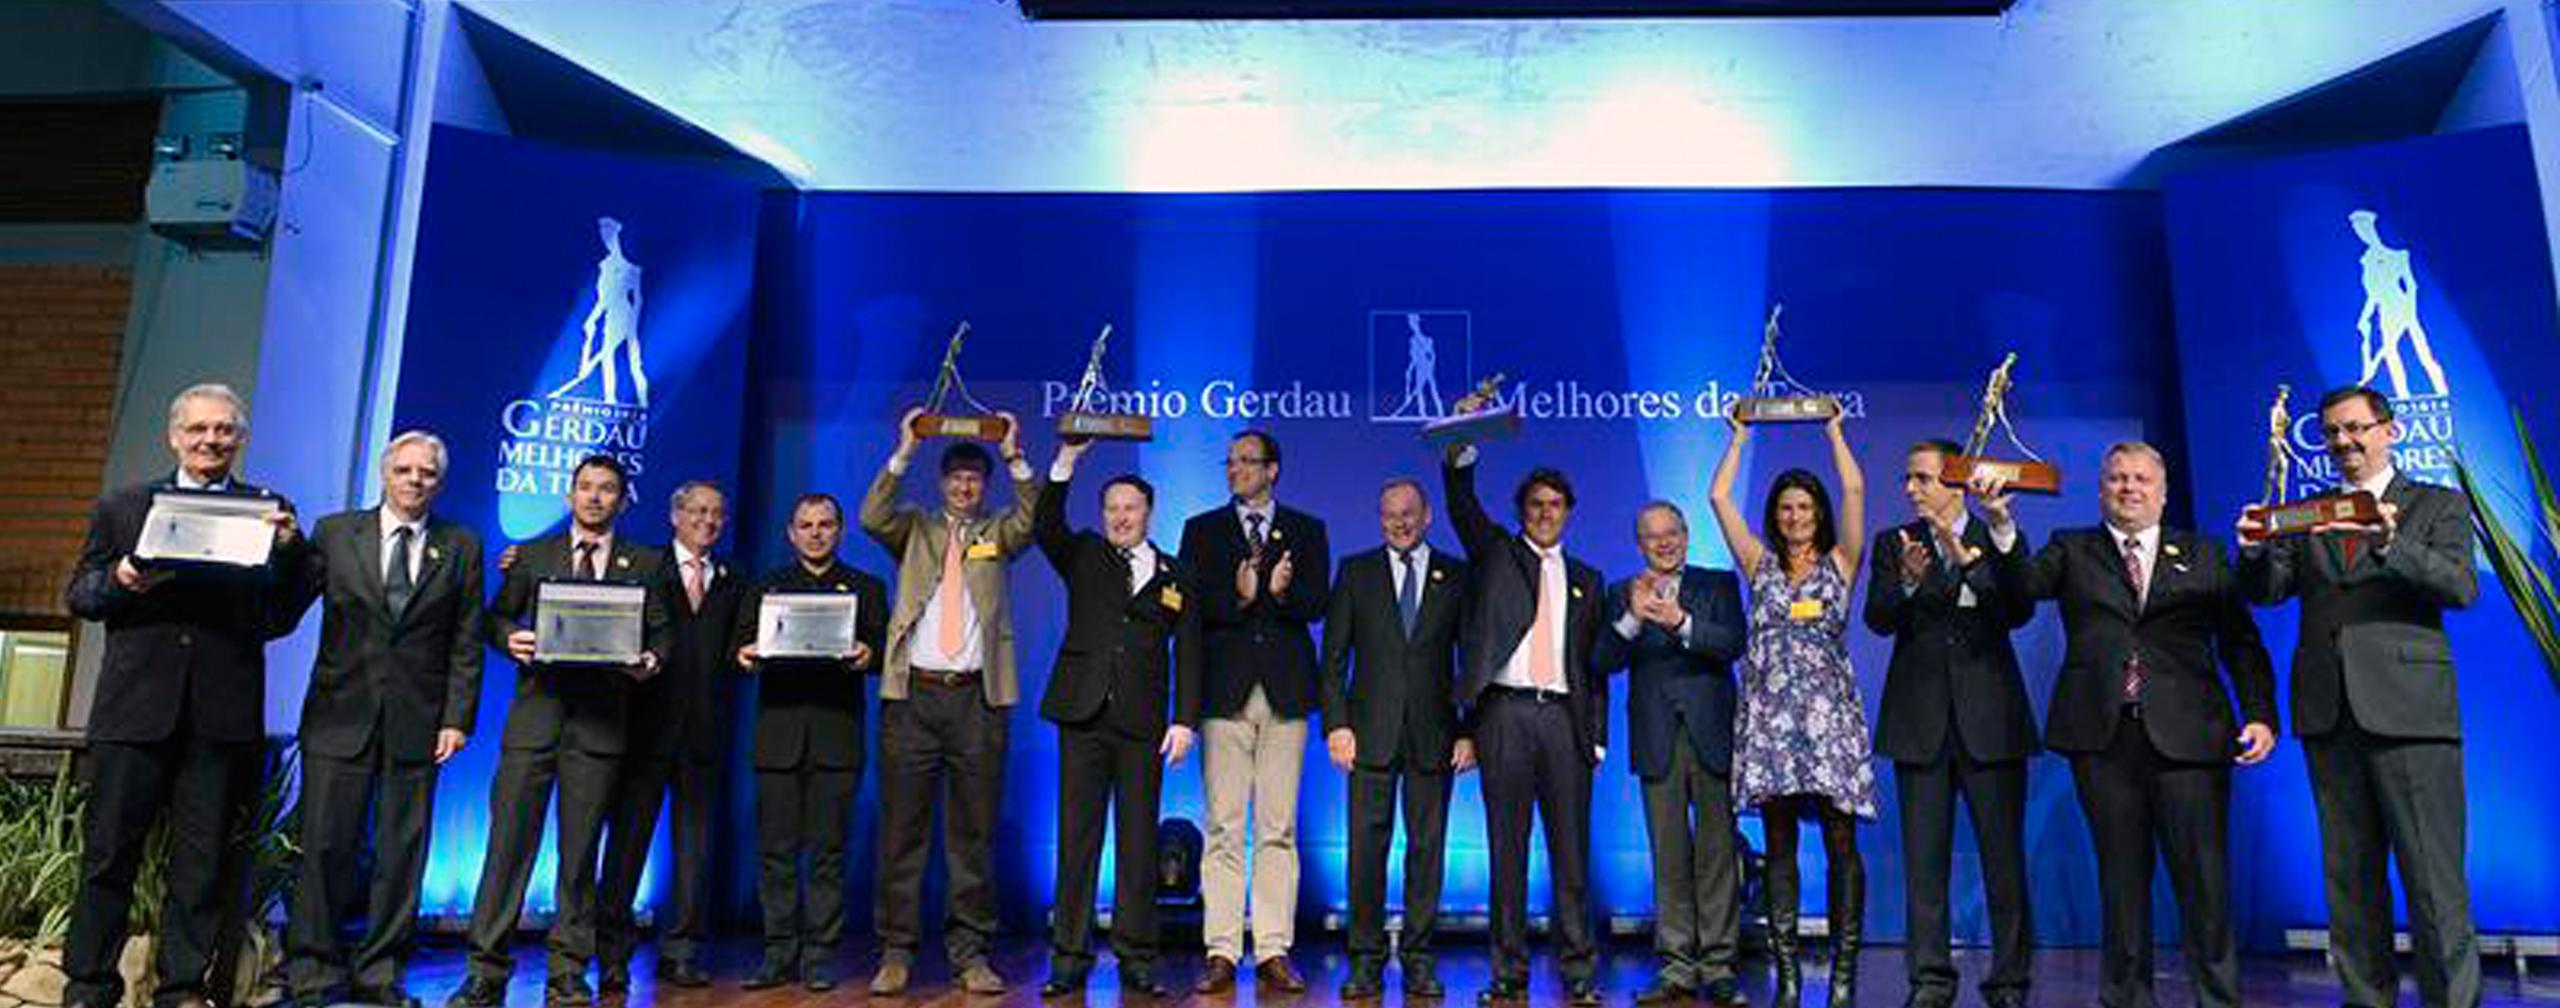 NIMEq ganha Prêmio Gerdau